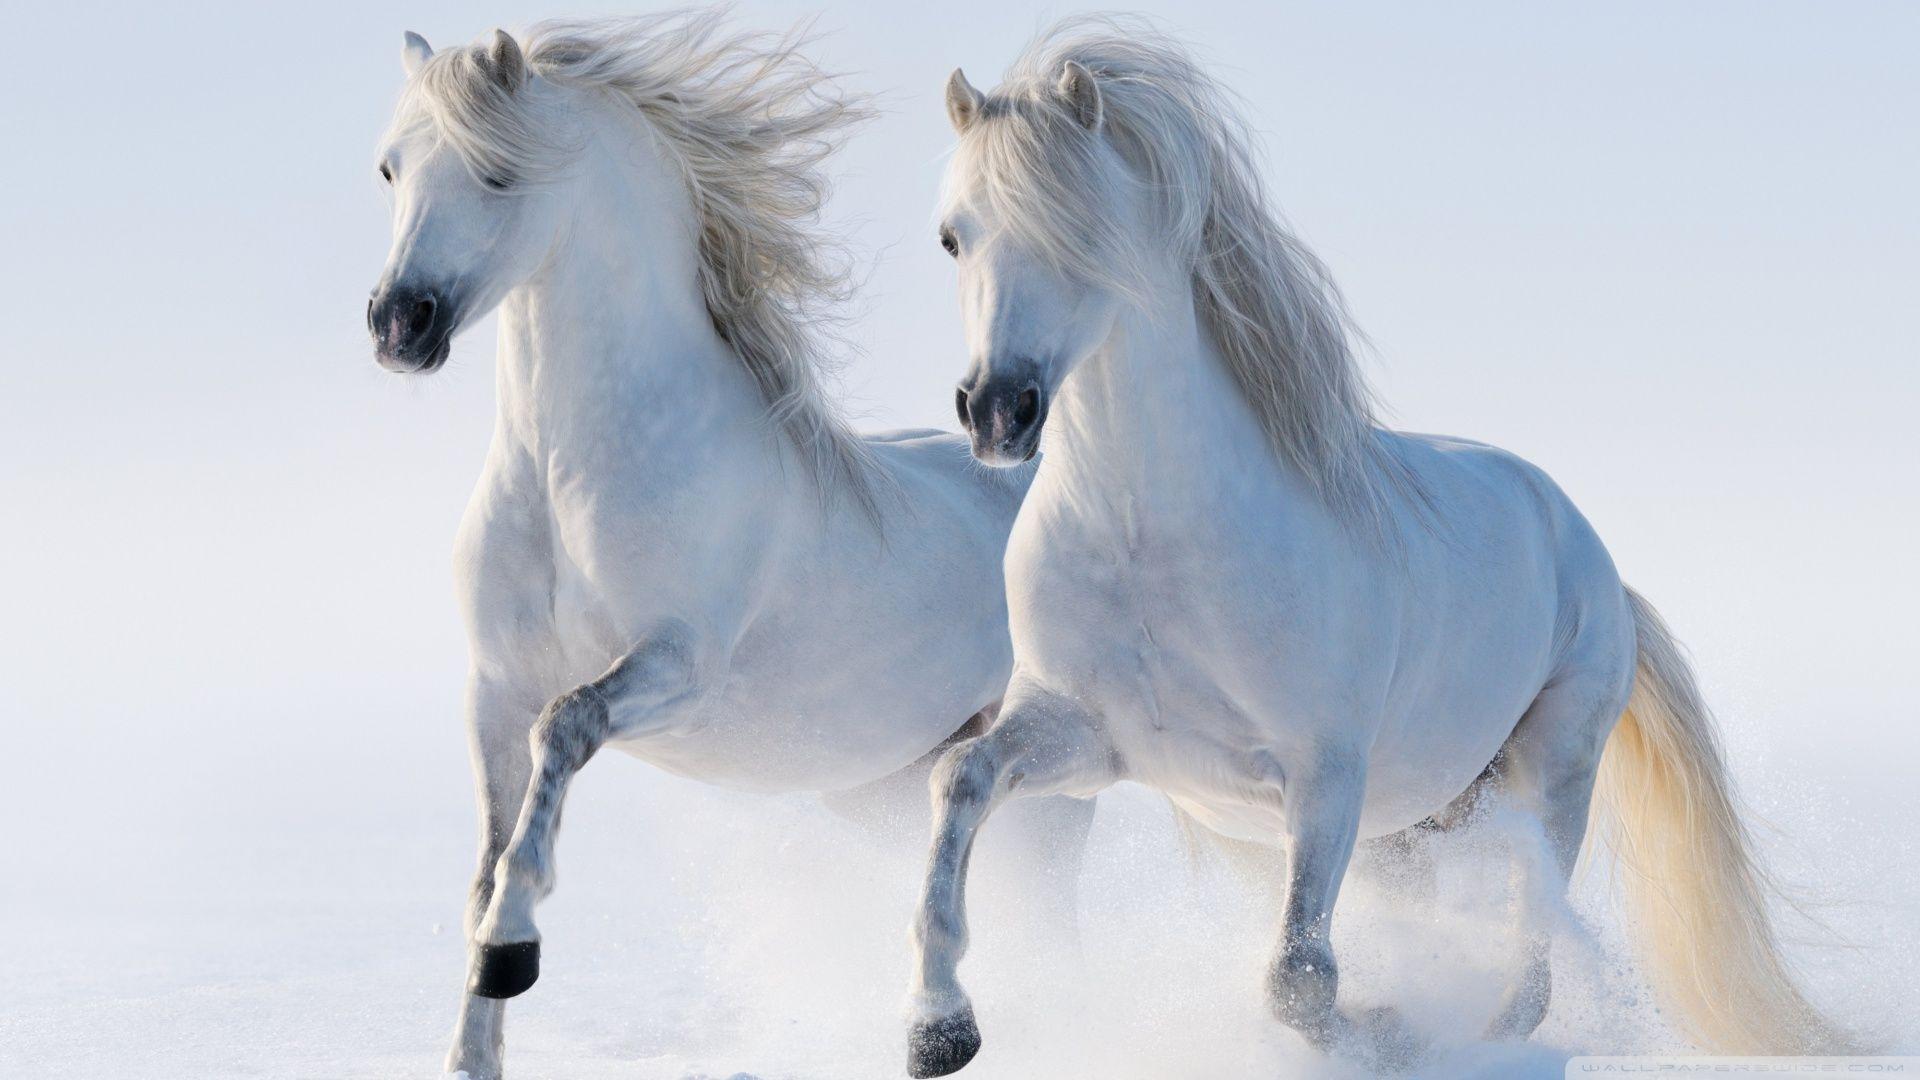 Amazing Wallpaper Horse Snow - cd932d178b3341ea7e166aa83c8ee741  Collection_59871.jpg